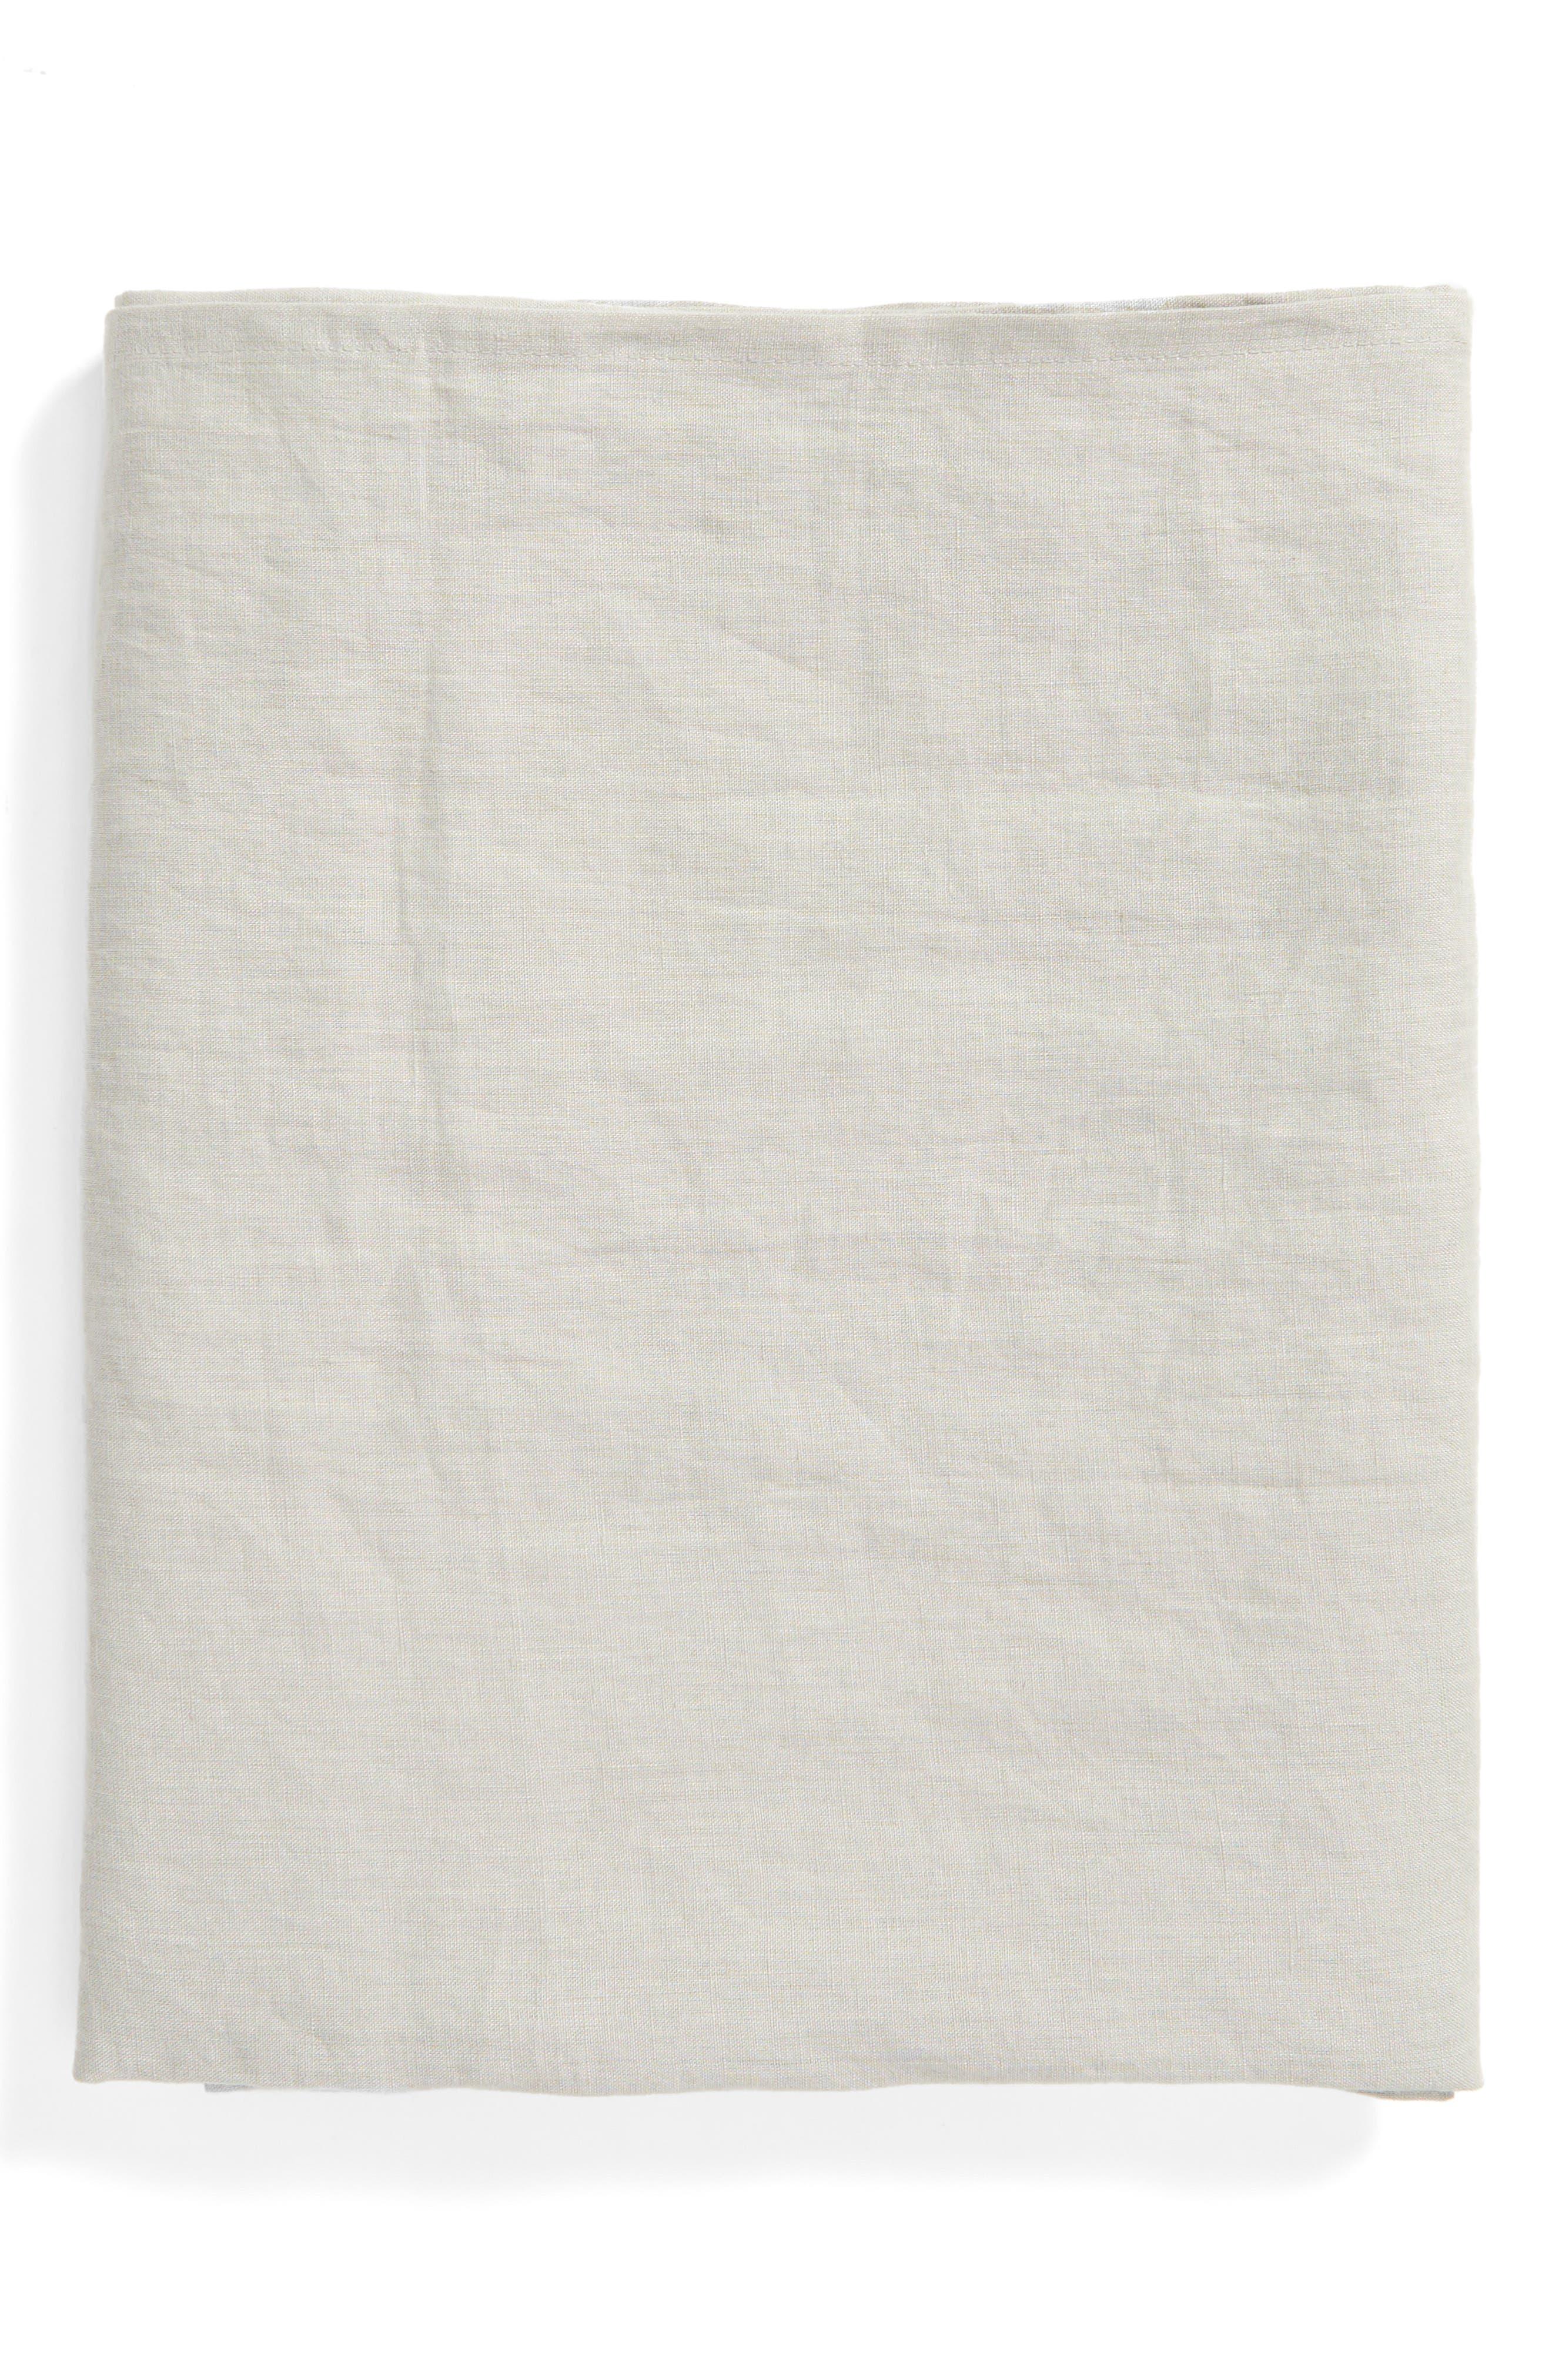 Washed Linen Tablecloth,                             Main thumbnail 1, color,